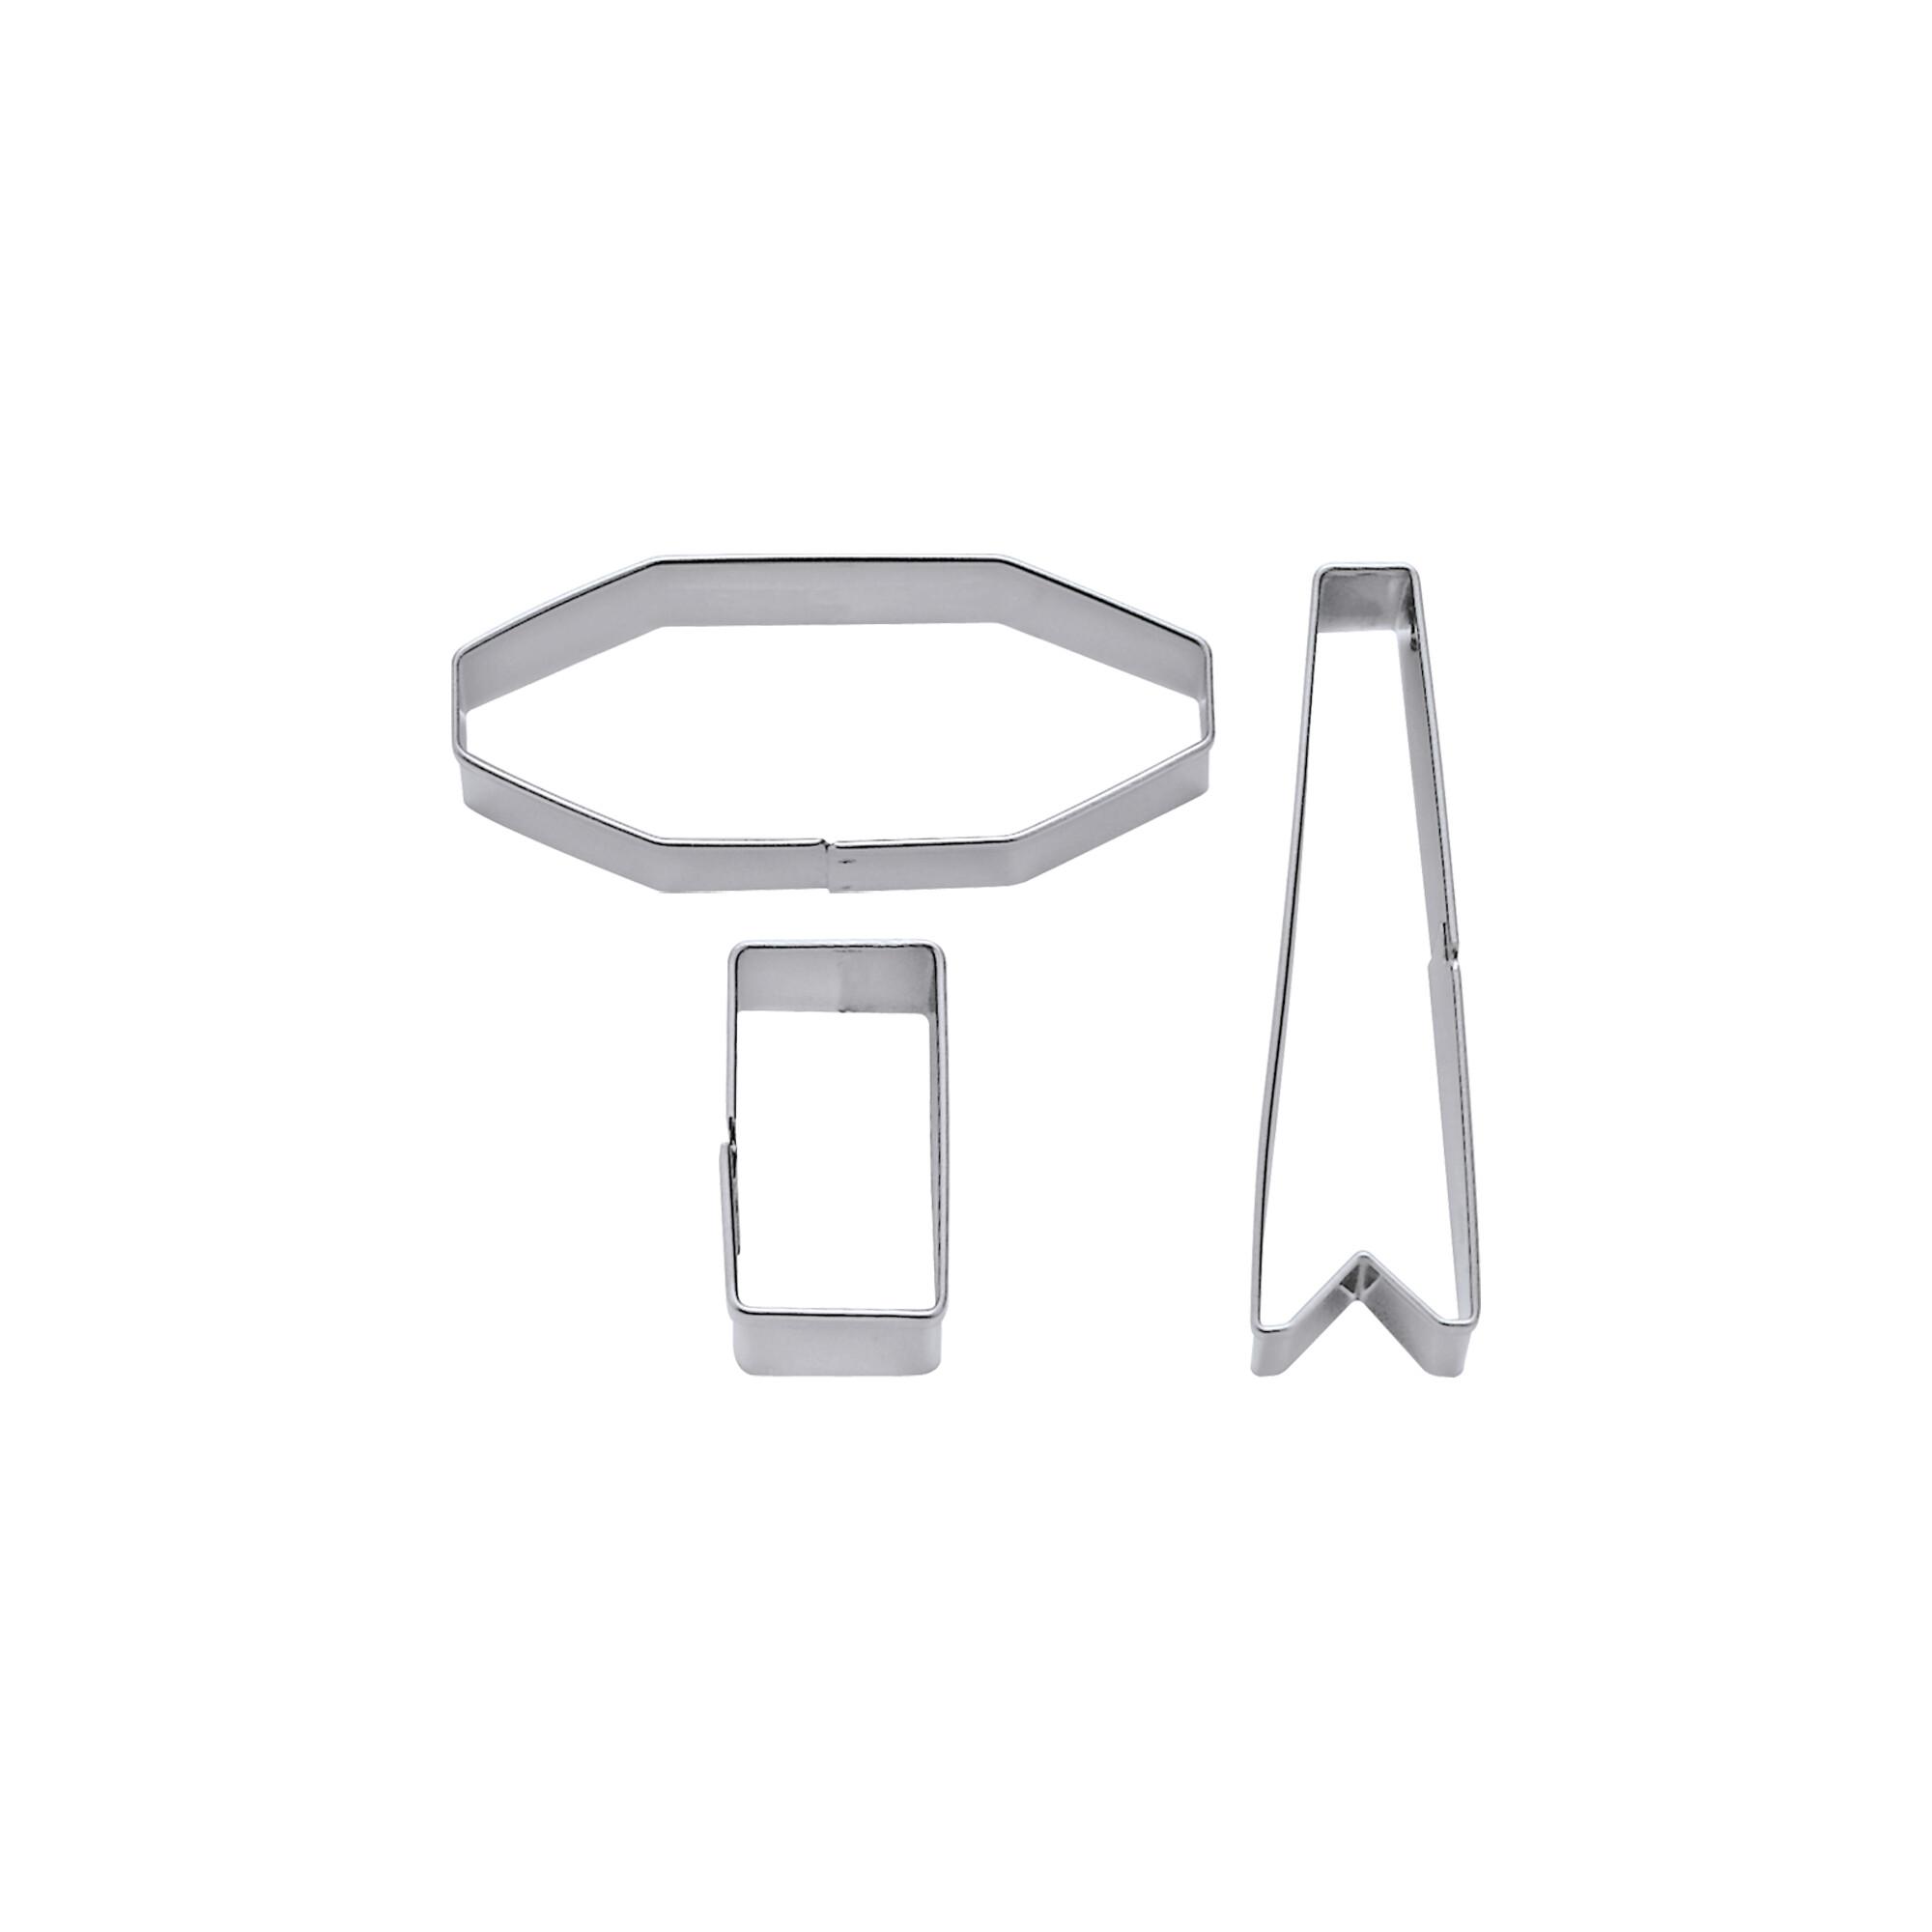 Professional cutter - Ribbon - Set, 3 parts